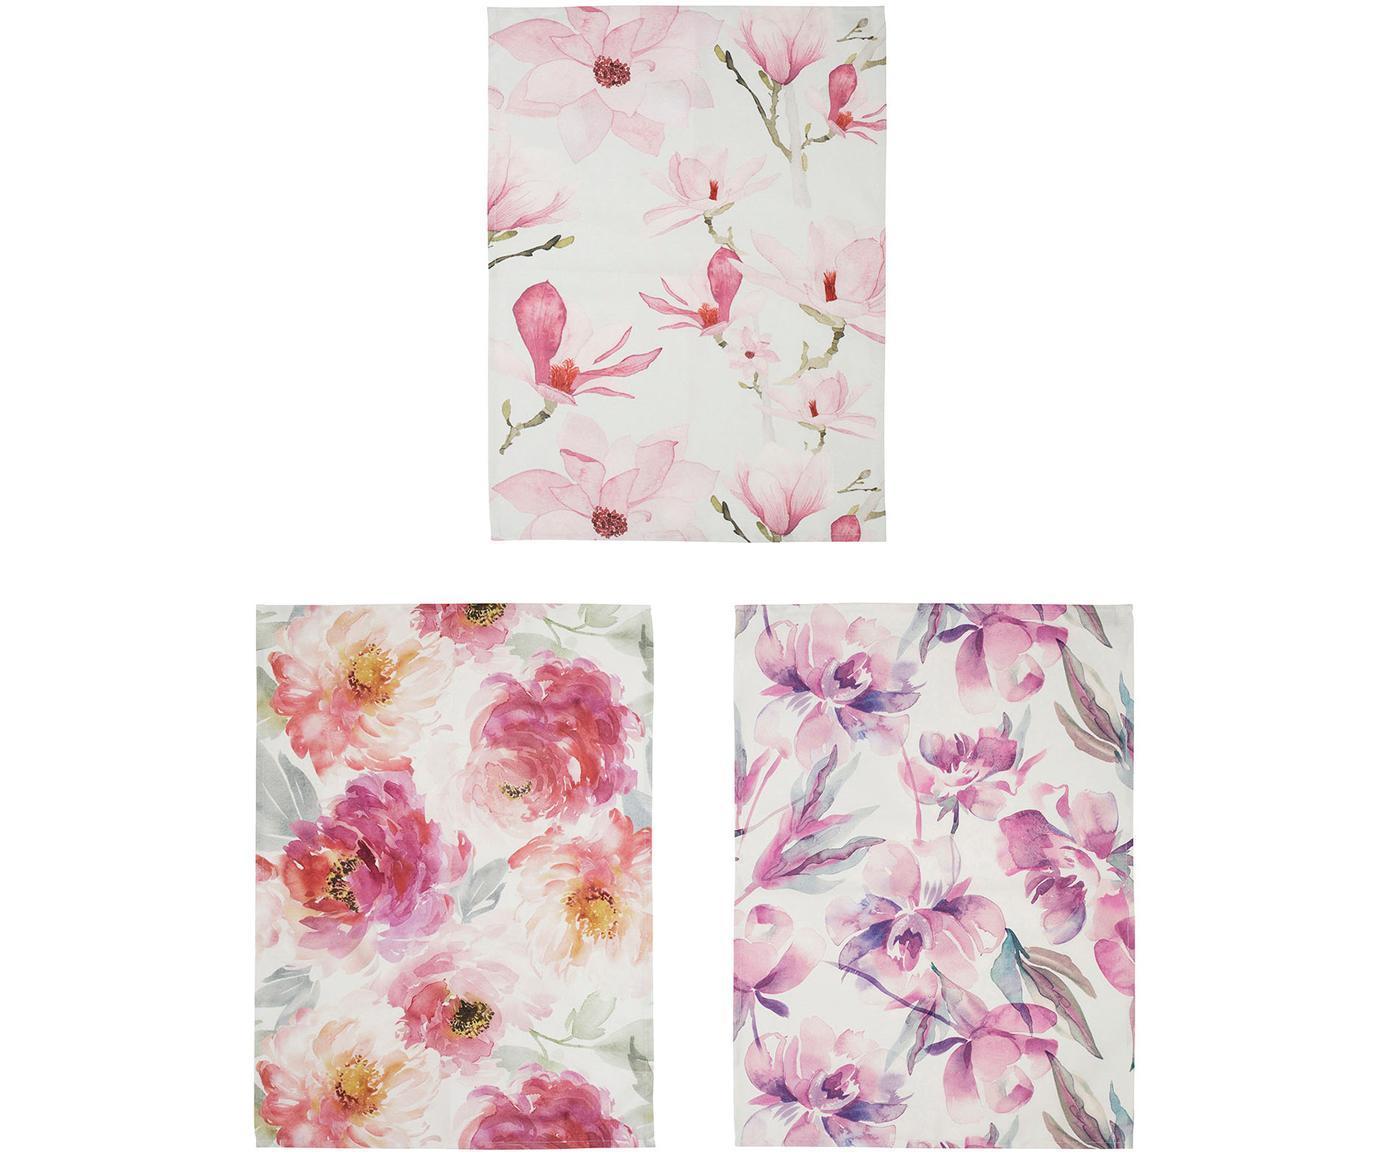 Set de paños de cocina Magnolia, 3pzas., Algodón, Blanco, rosa, An 50 x L 70 cm